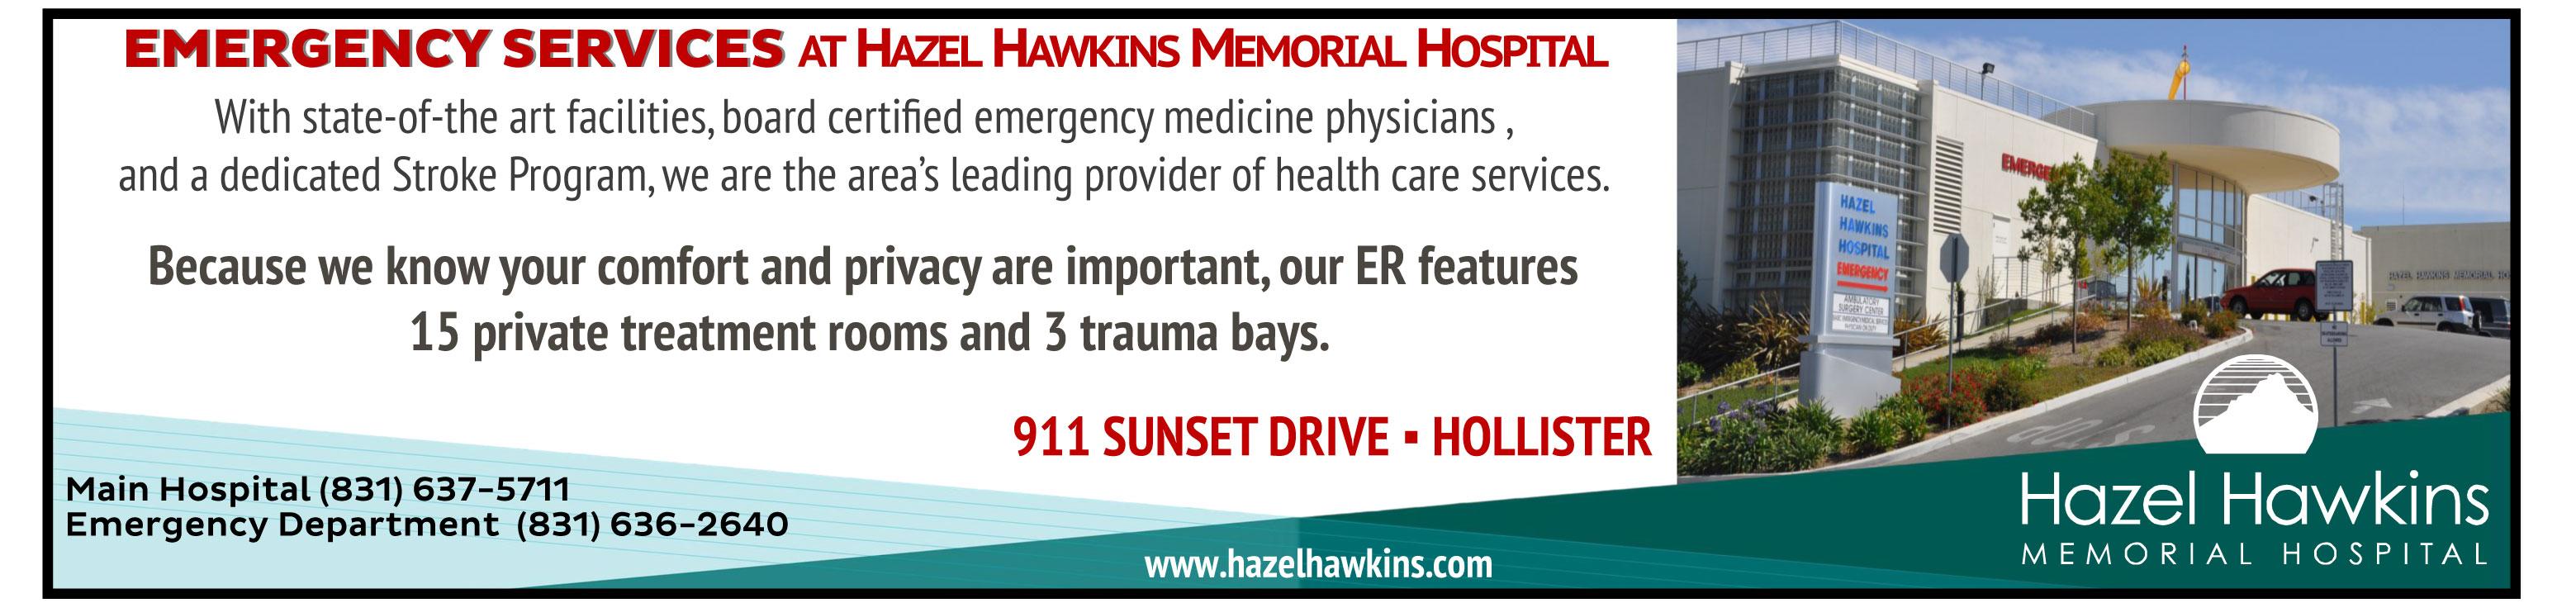 Hazel Hawkins Hospital